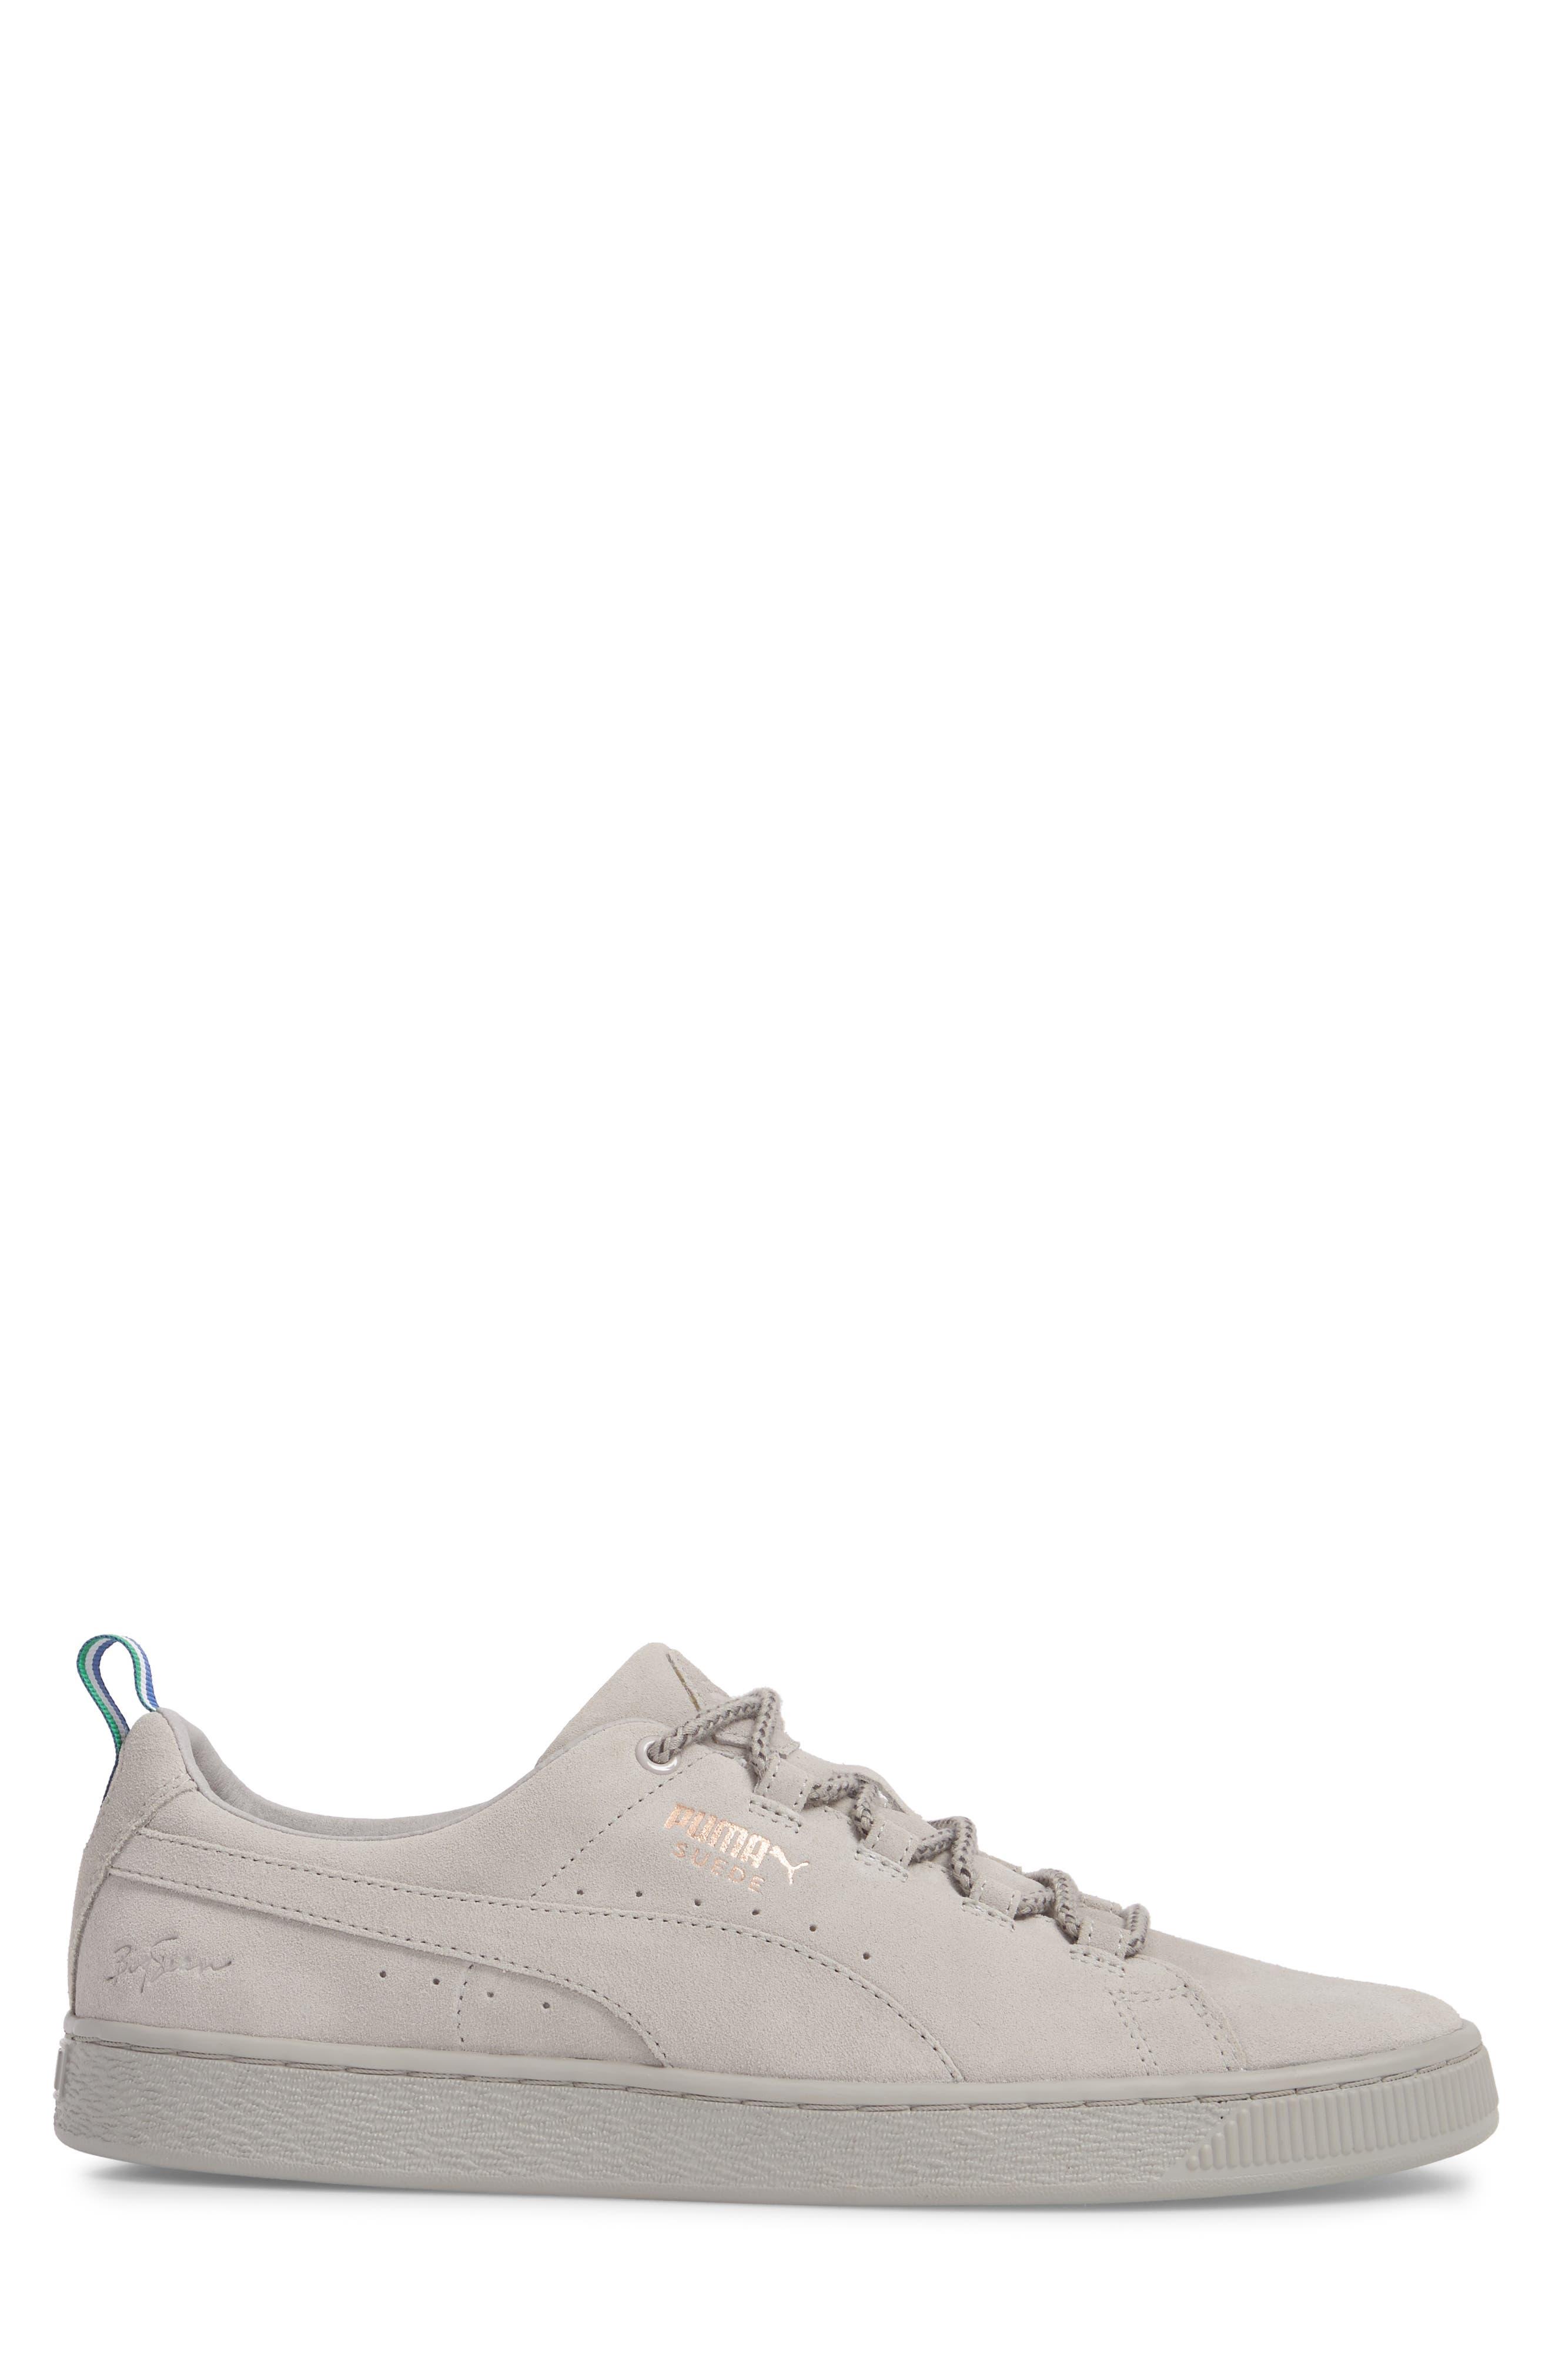 x Big Sean Suede Sneaker,                             Alternate thumbnail 3, color,                             060